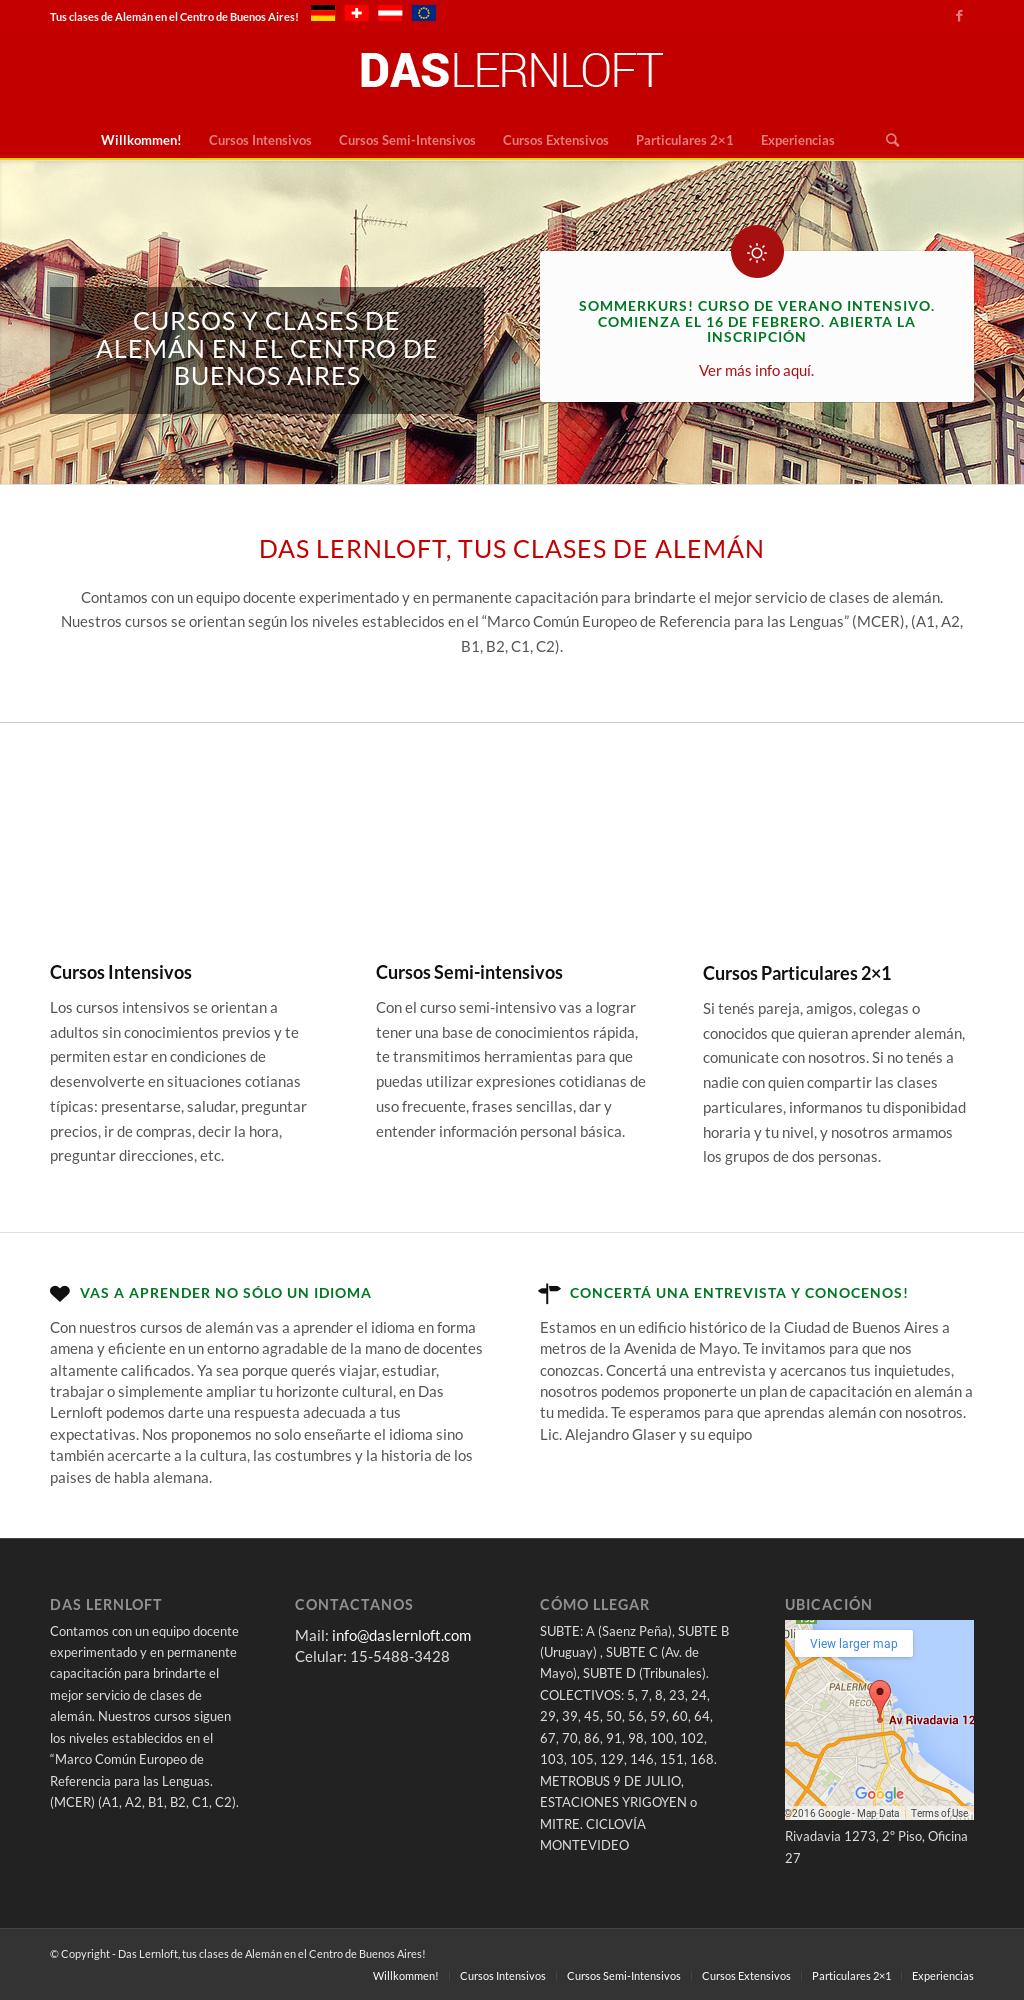 Das Lernloft Competitors, Revenue and Employees - Owler Company Profile